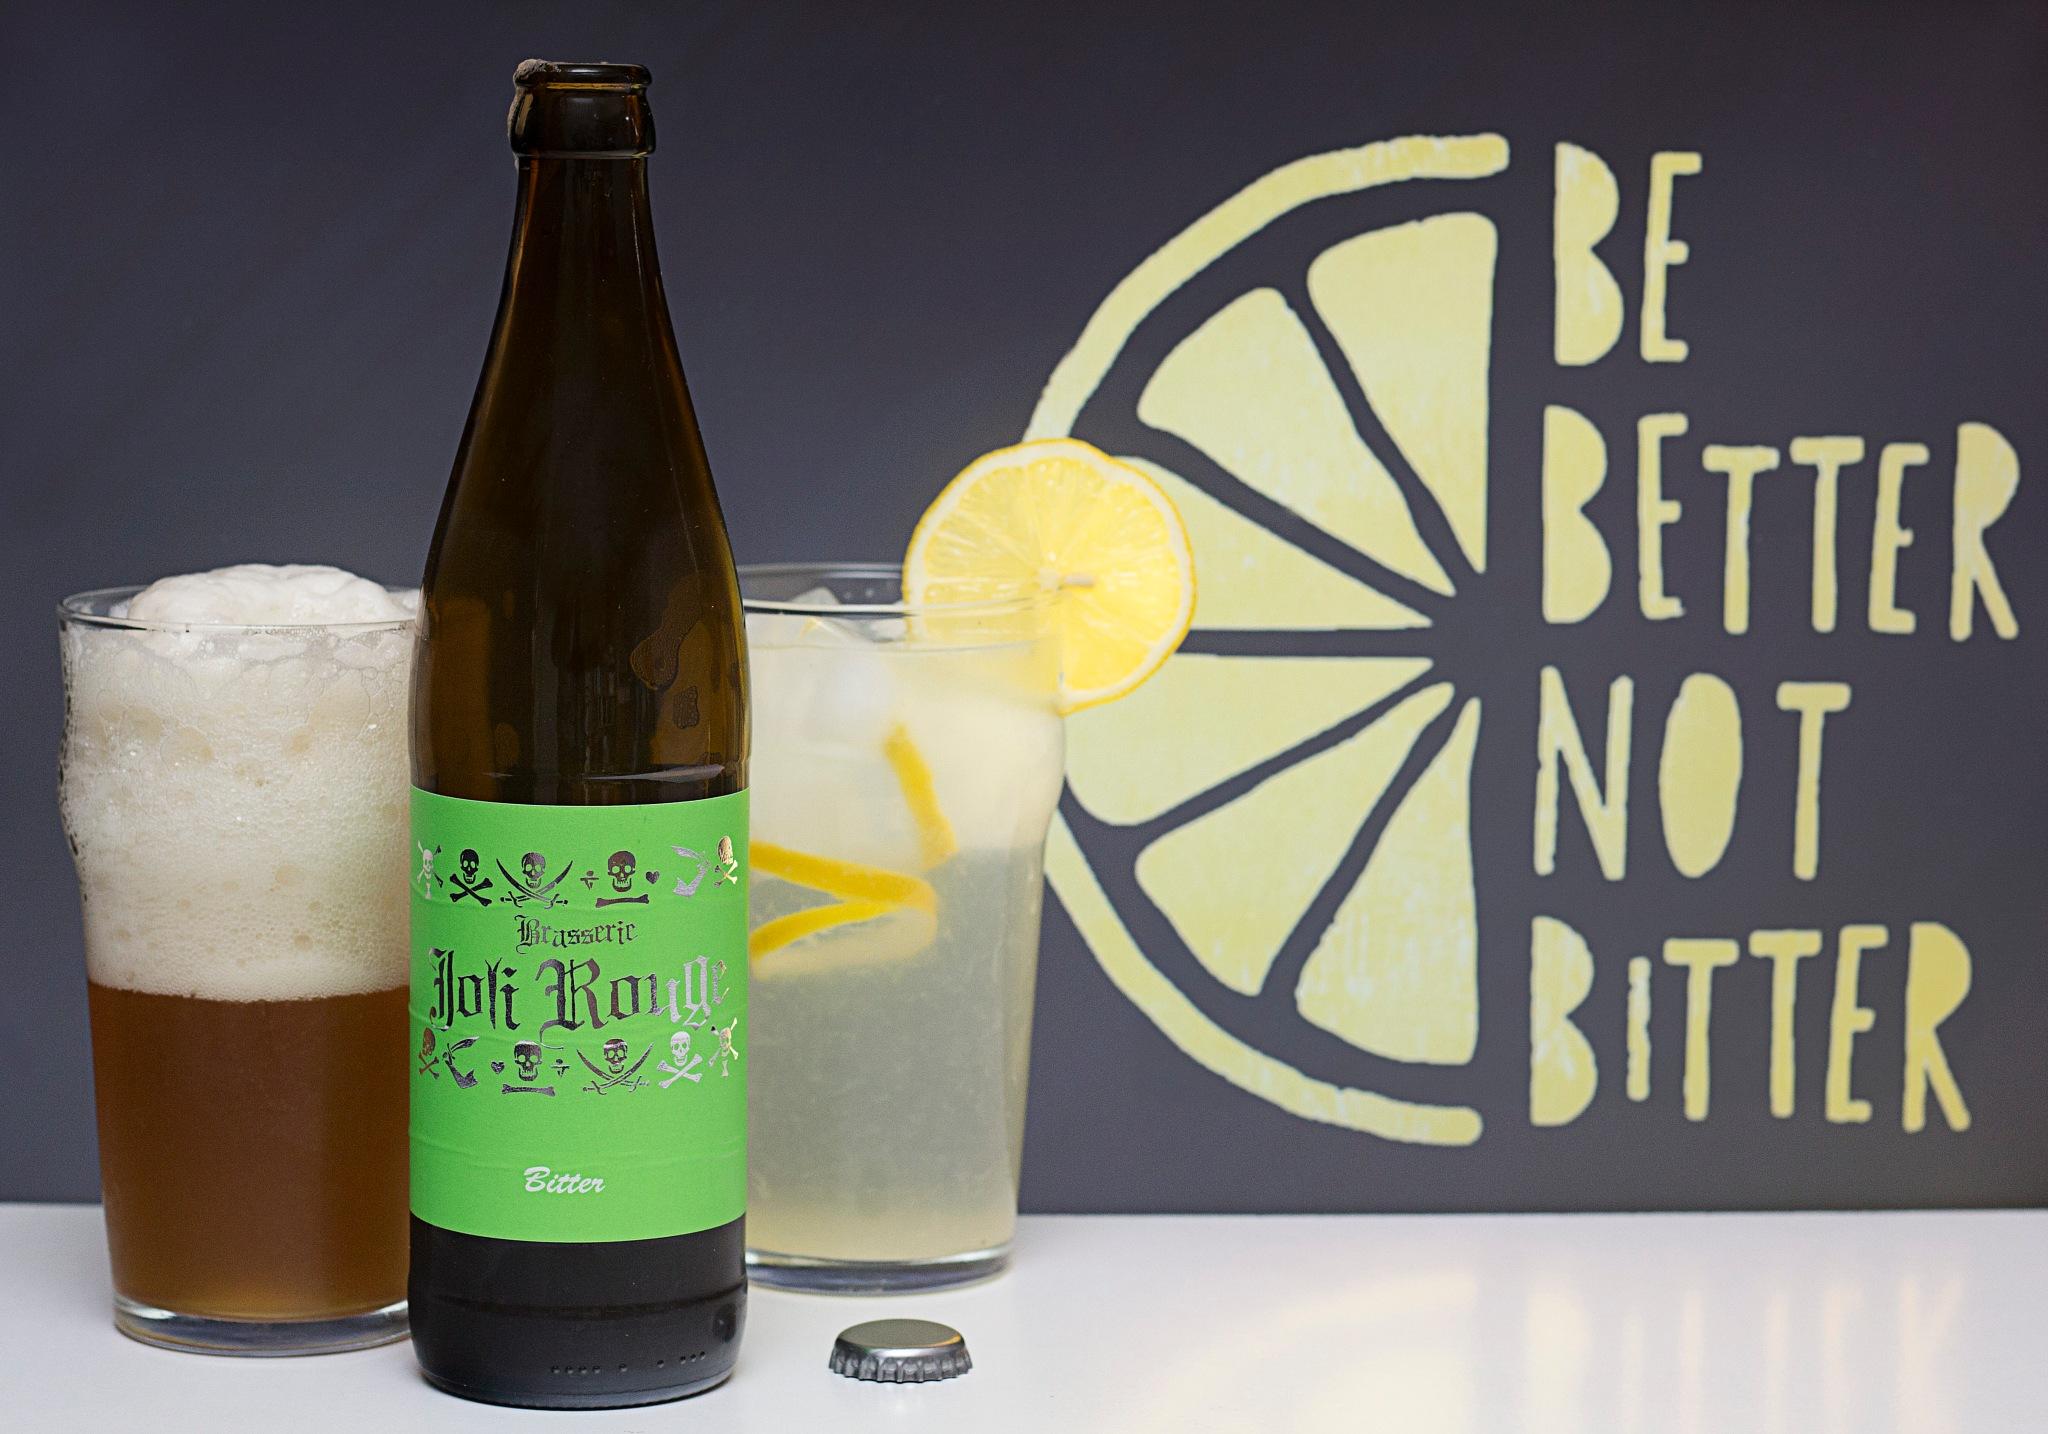 Bitter, citronnade - Be better not bitter by Franck Rouanet